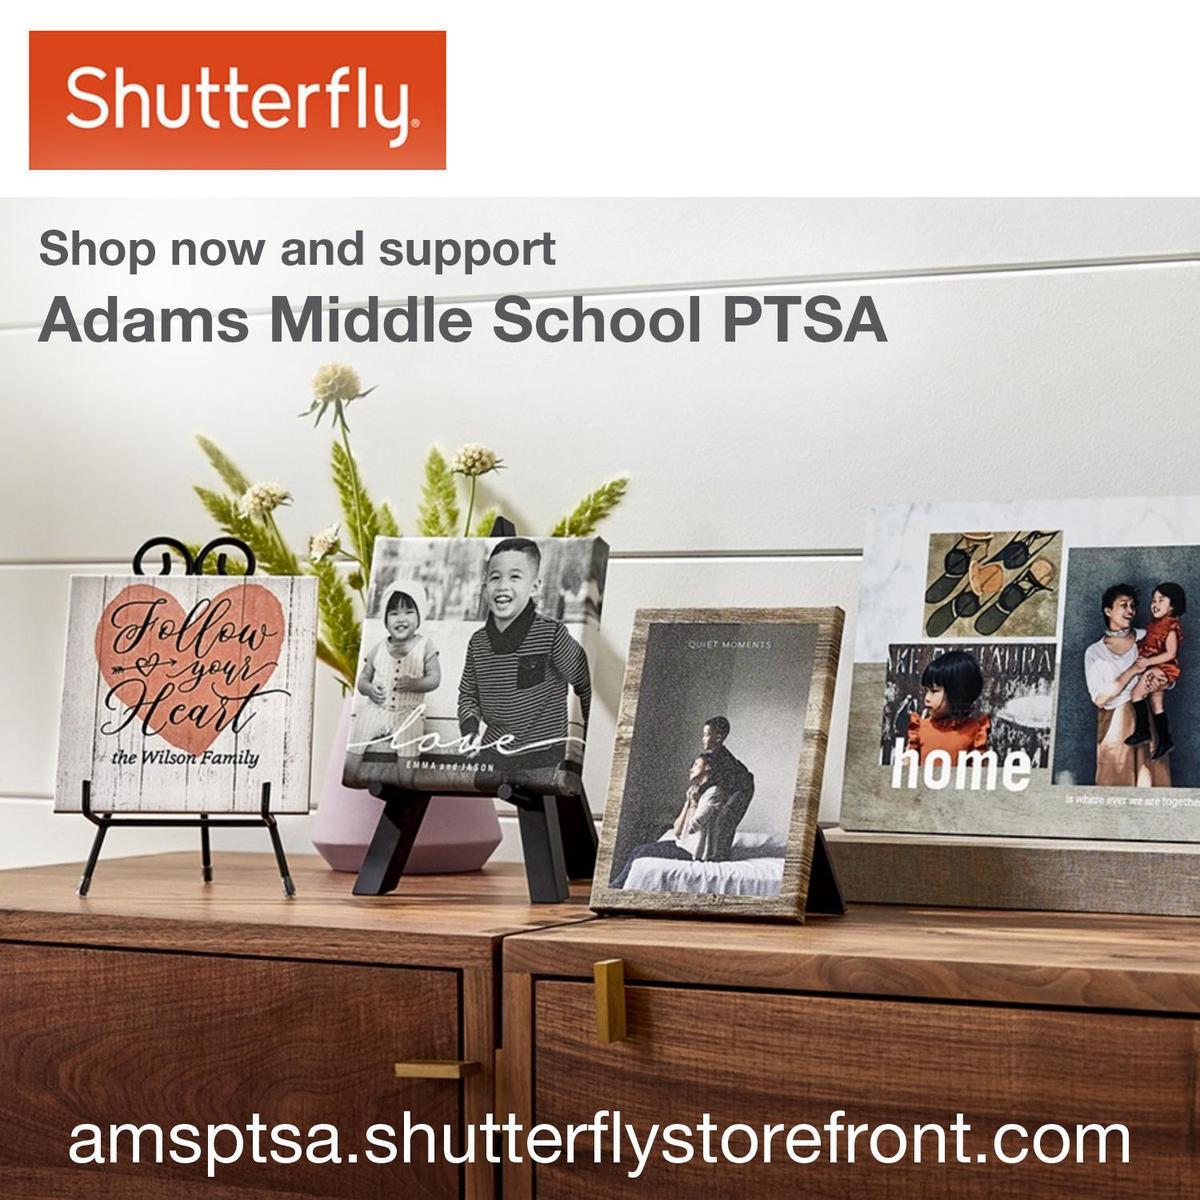 amsptsa.shutterflystorefront.com